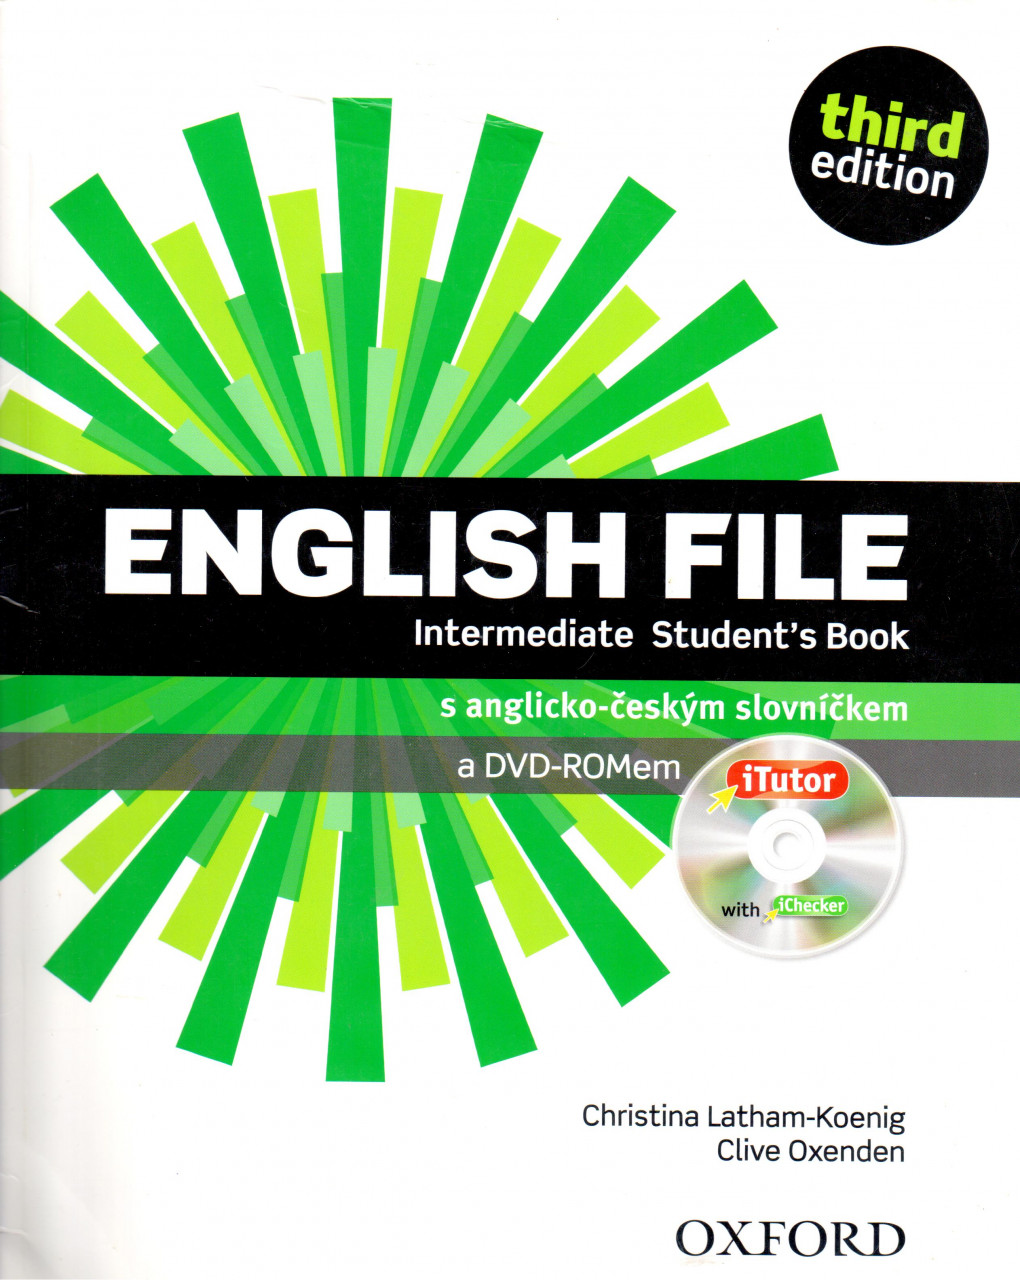 English File: Intermediate Student's Book (3rd edition)